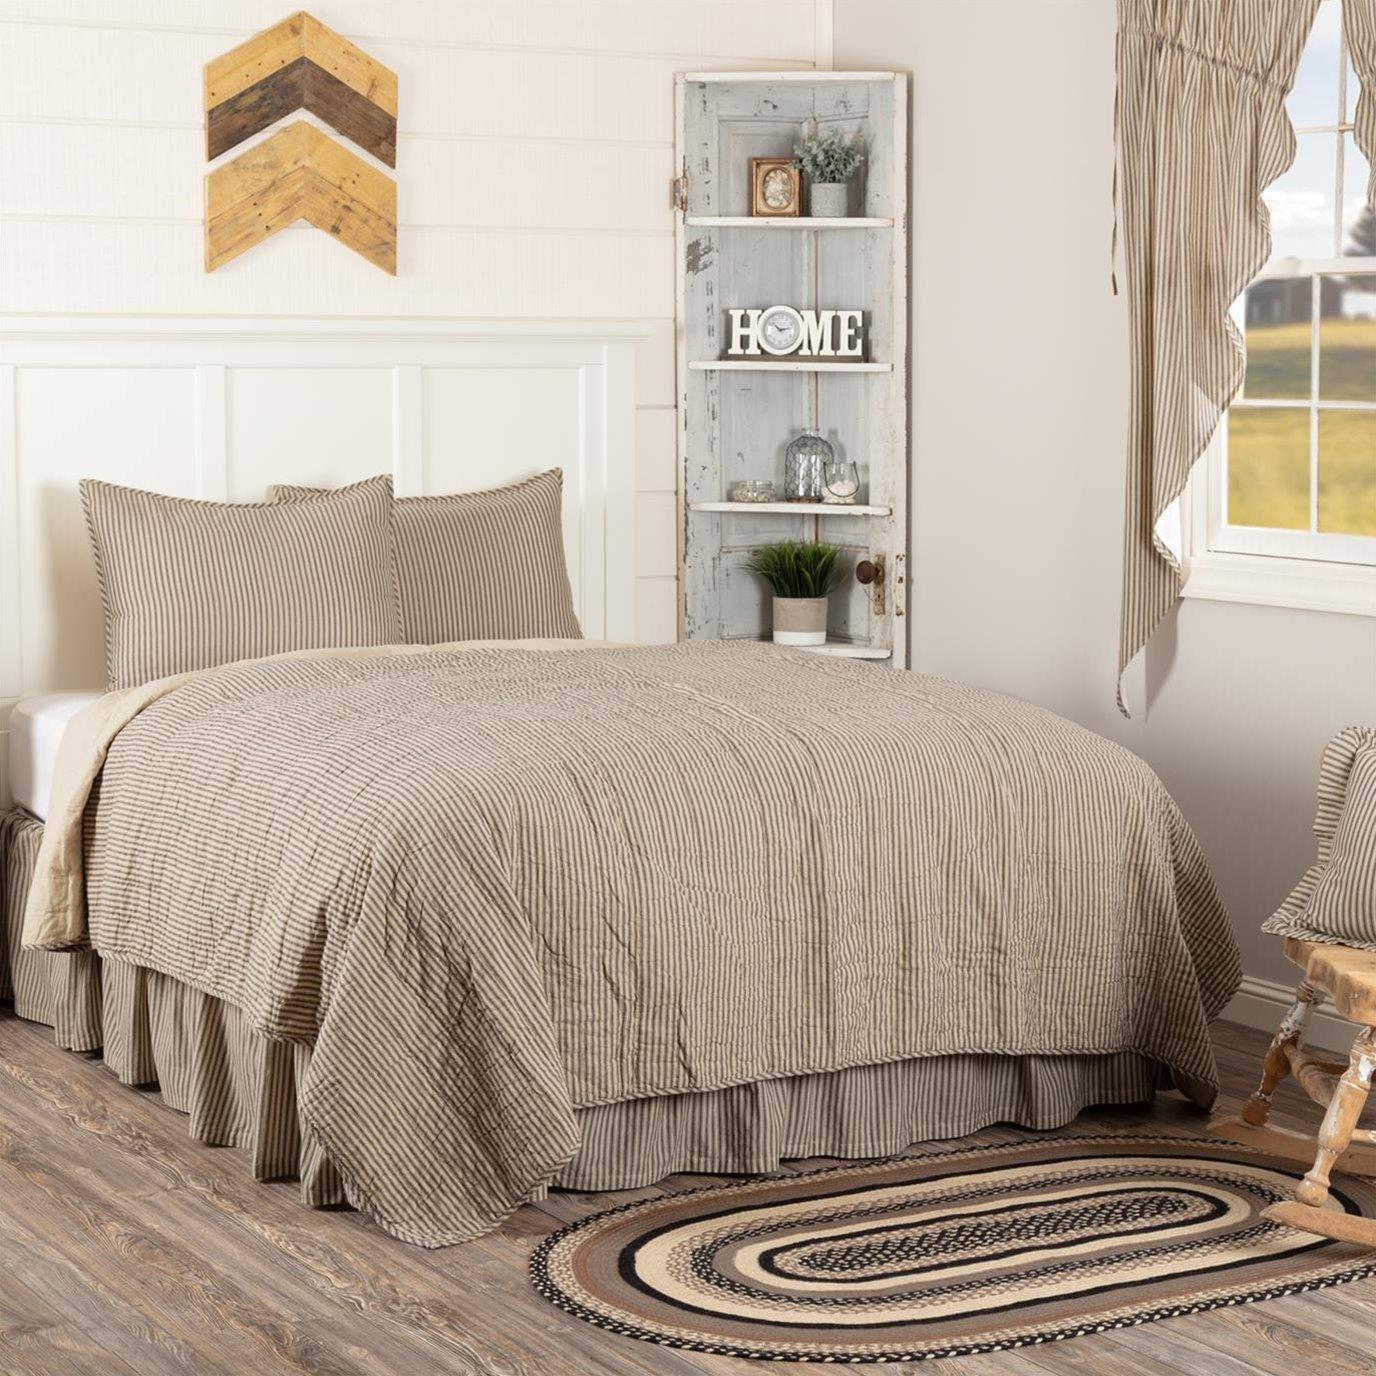 Sawyer Mill Charcoal Ticking Stripe California King Quilt Set; 1-Quilt 130Wx115L w/2 Shams 21x37